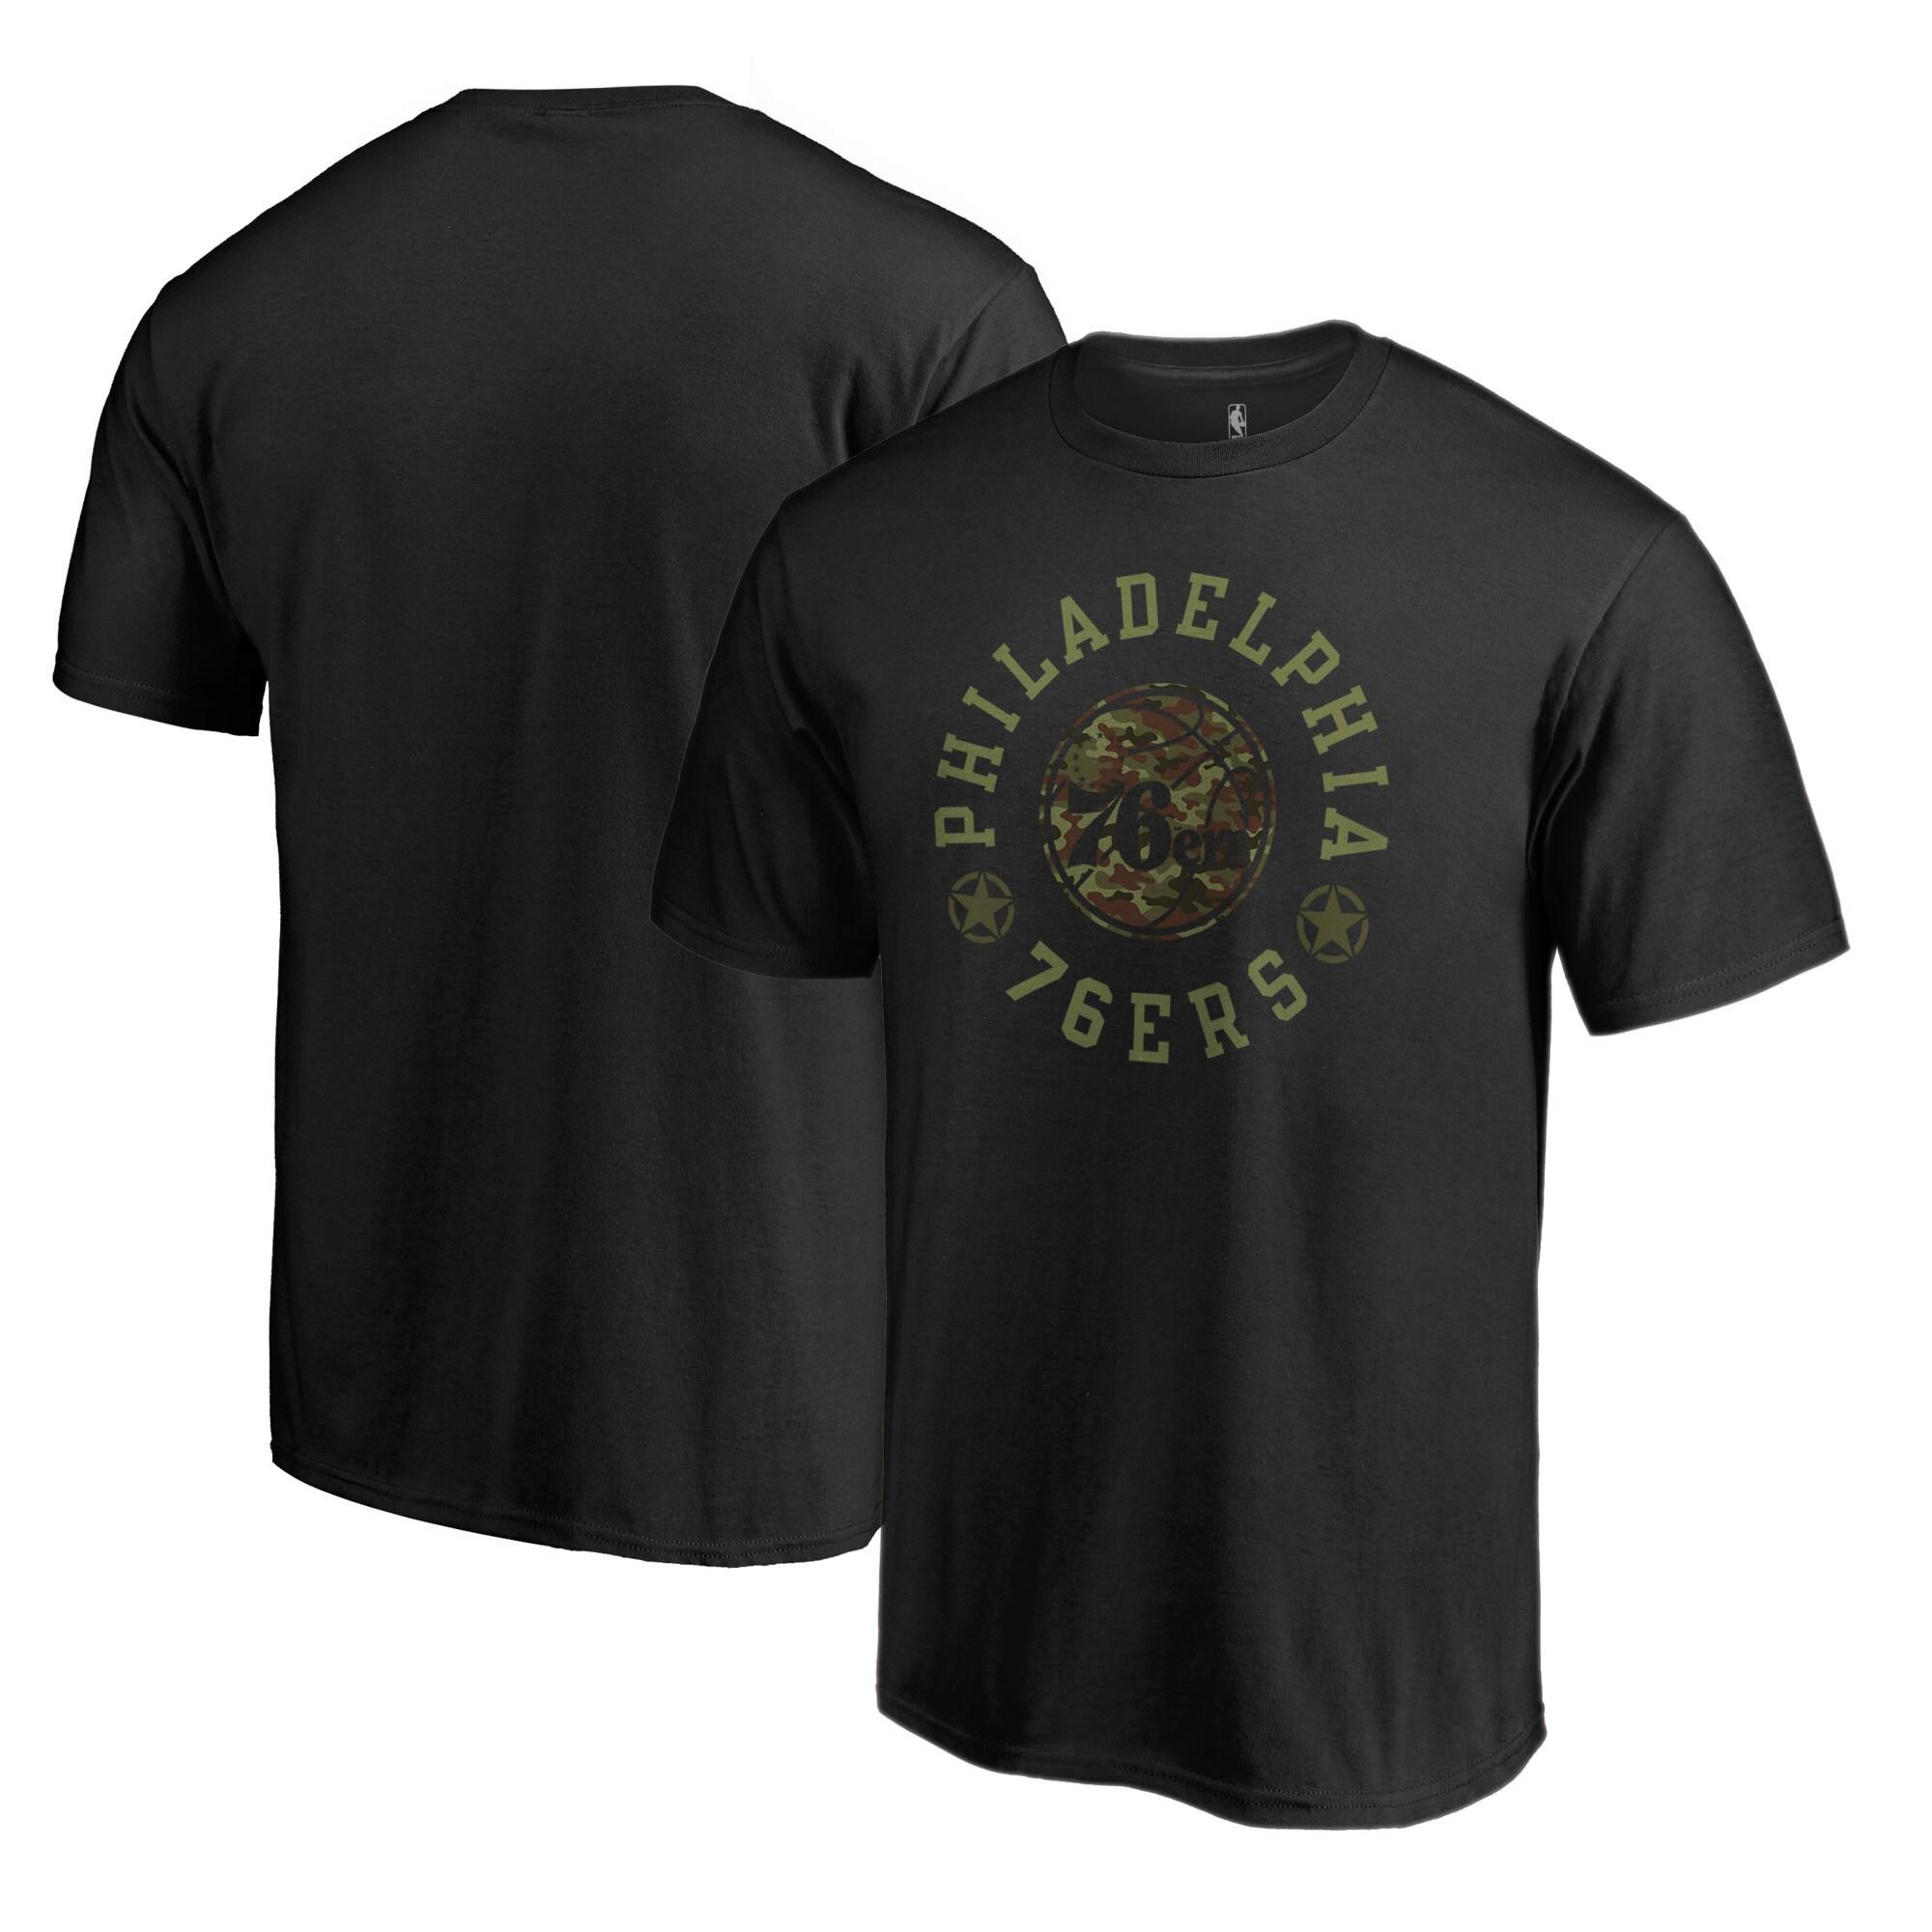 Philadelphia 76ers Fanatics Branded Liberty Big and Tall T-Shirt - Black